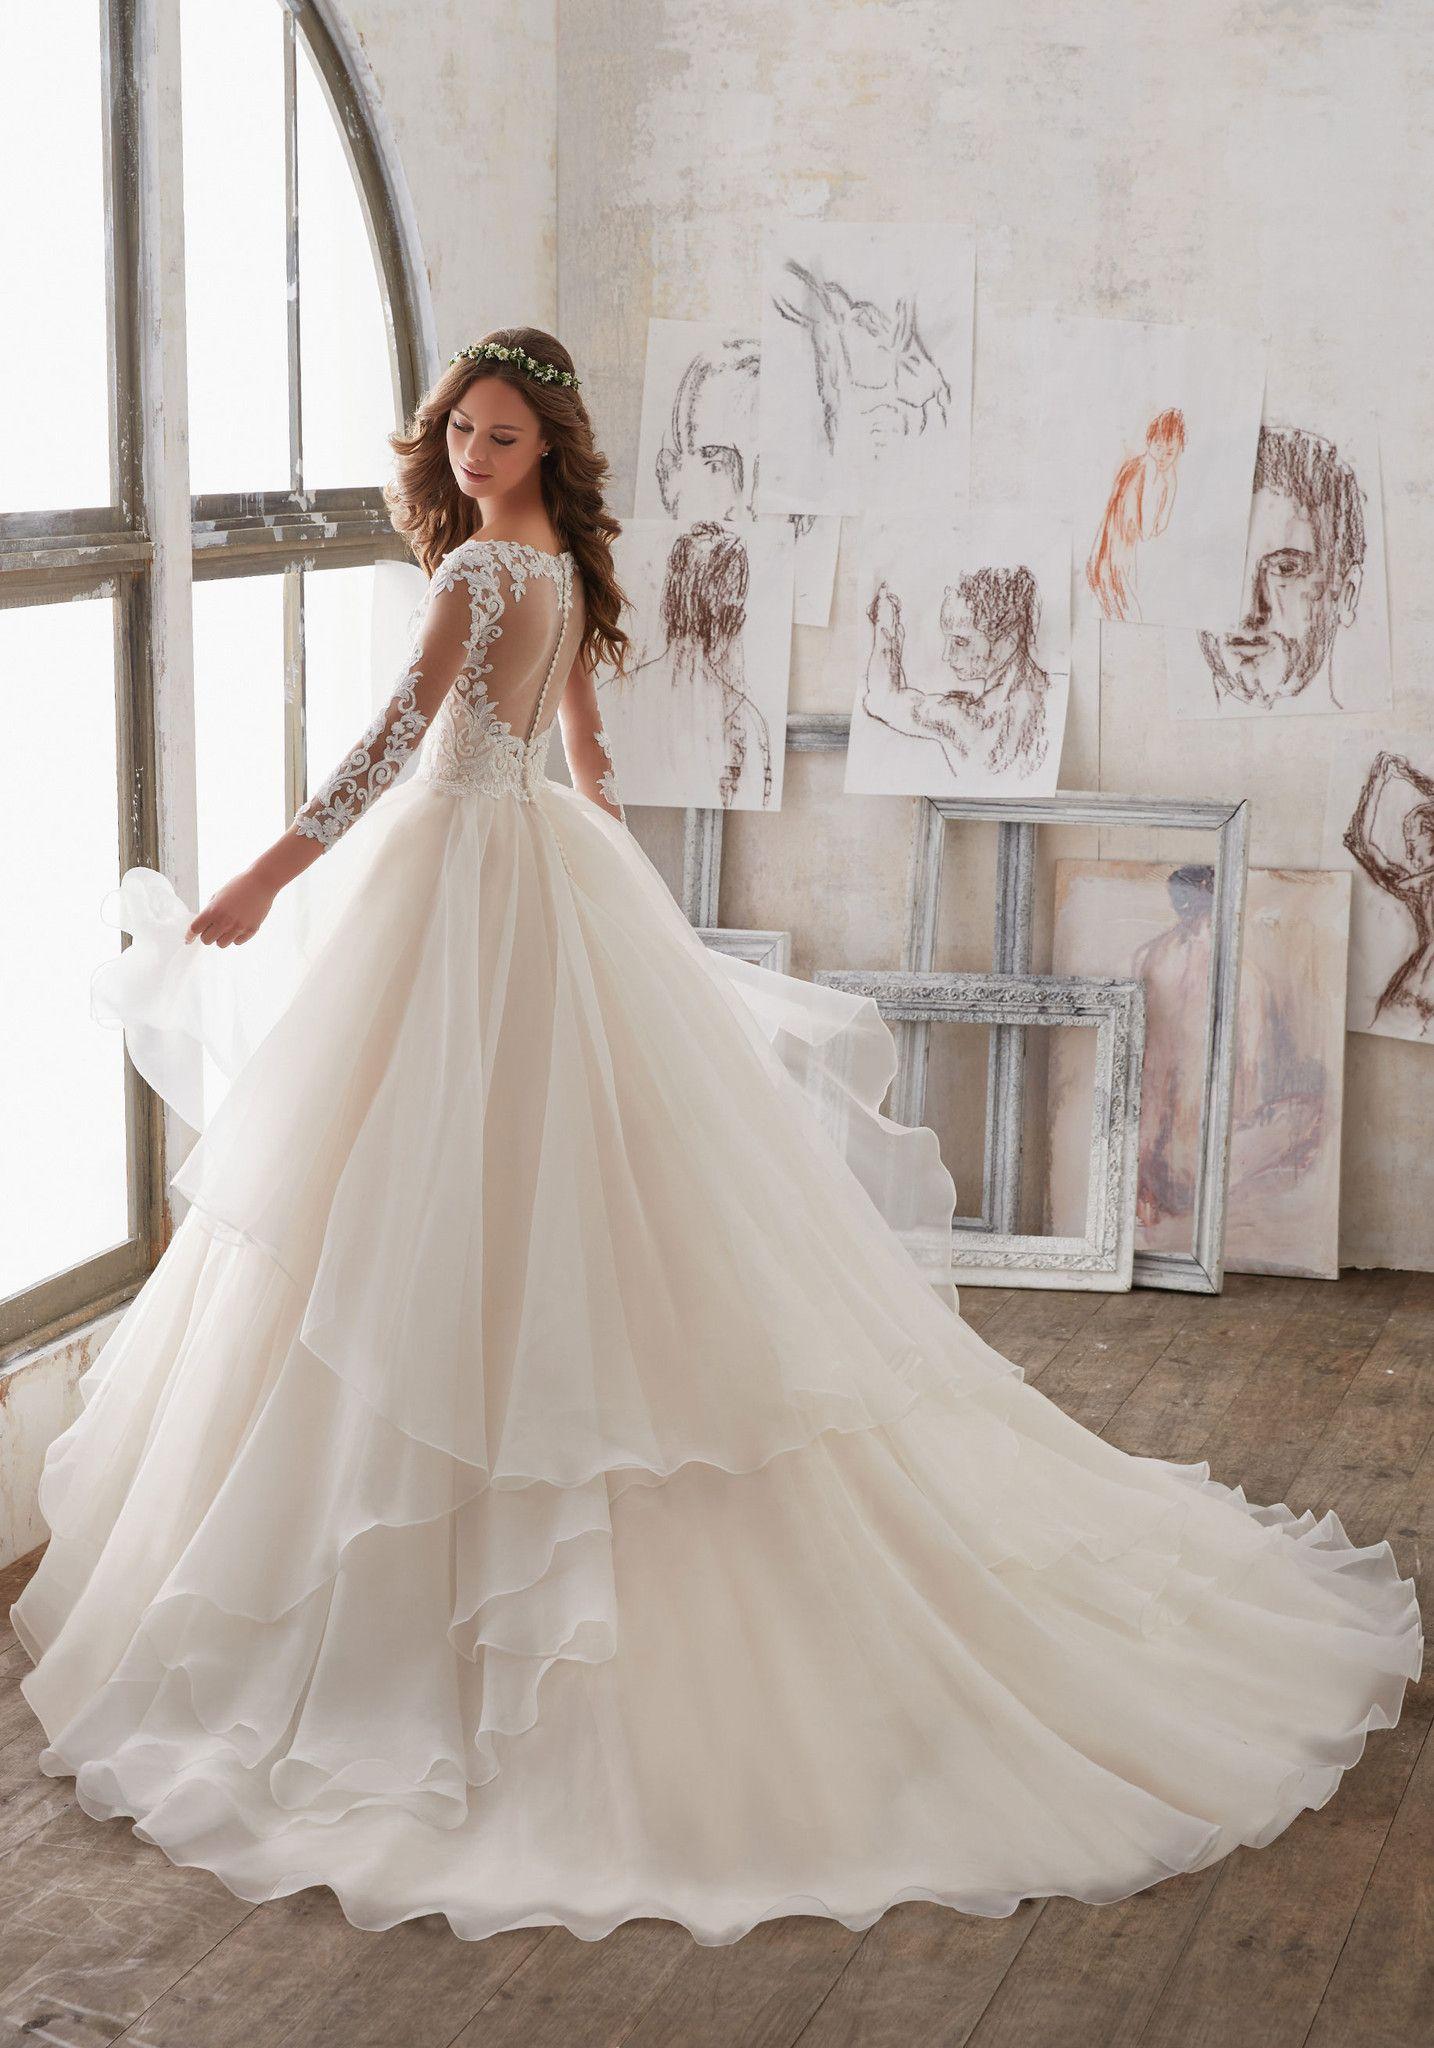 Blu - Maya - 5517 - All Dressed Up, Bridal Gown - Morilee ...